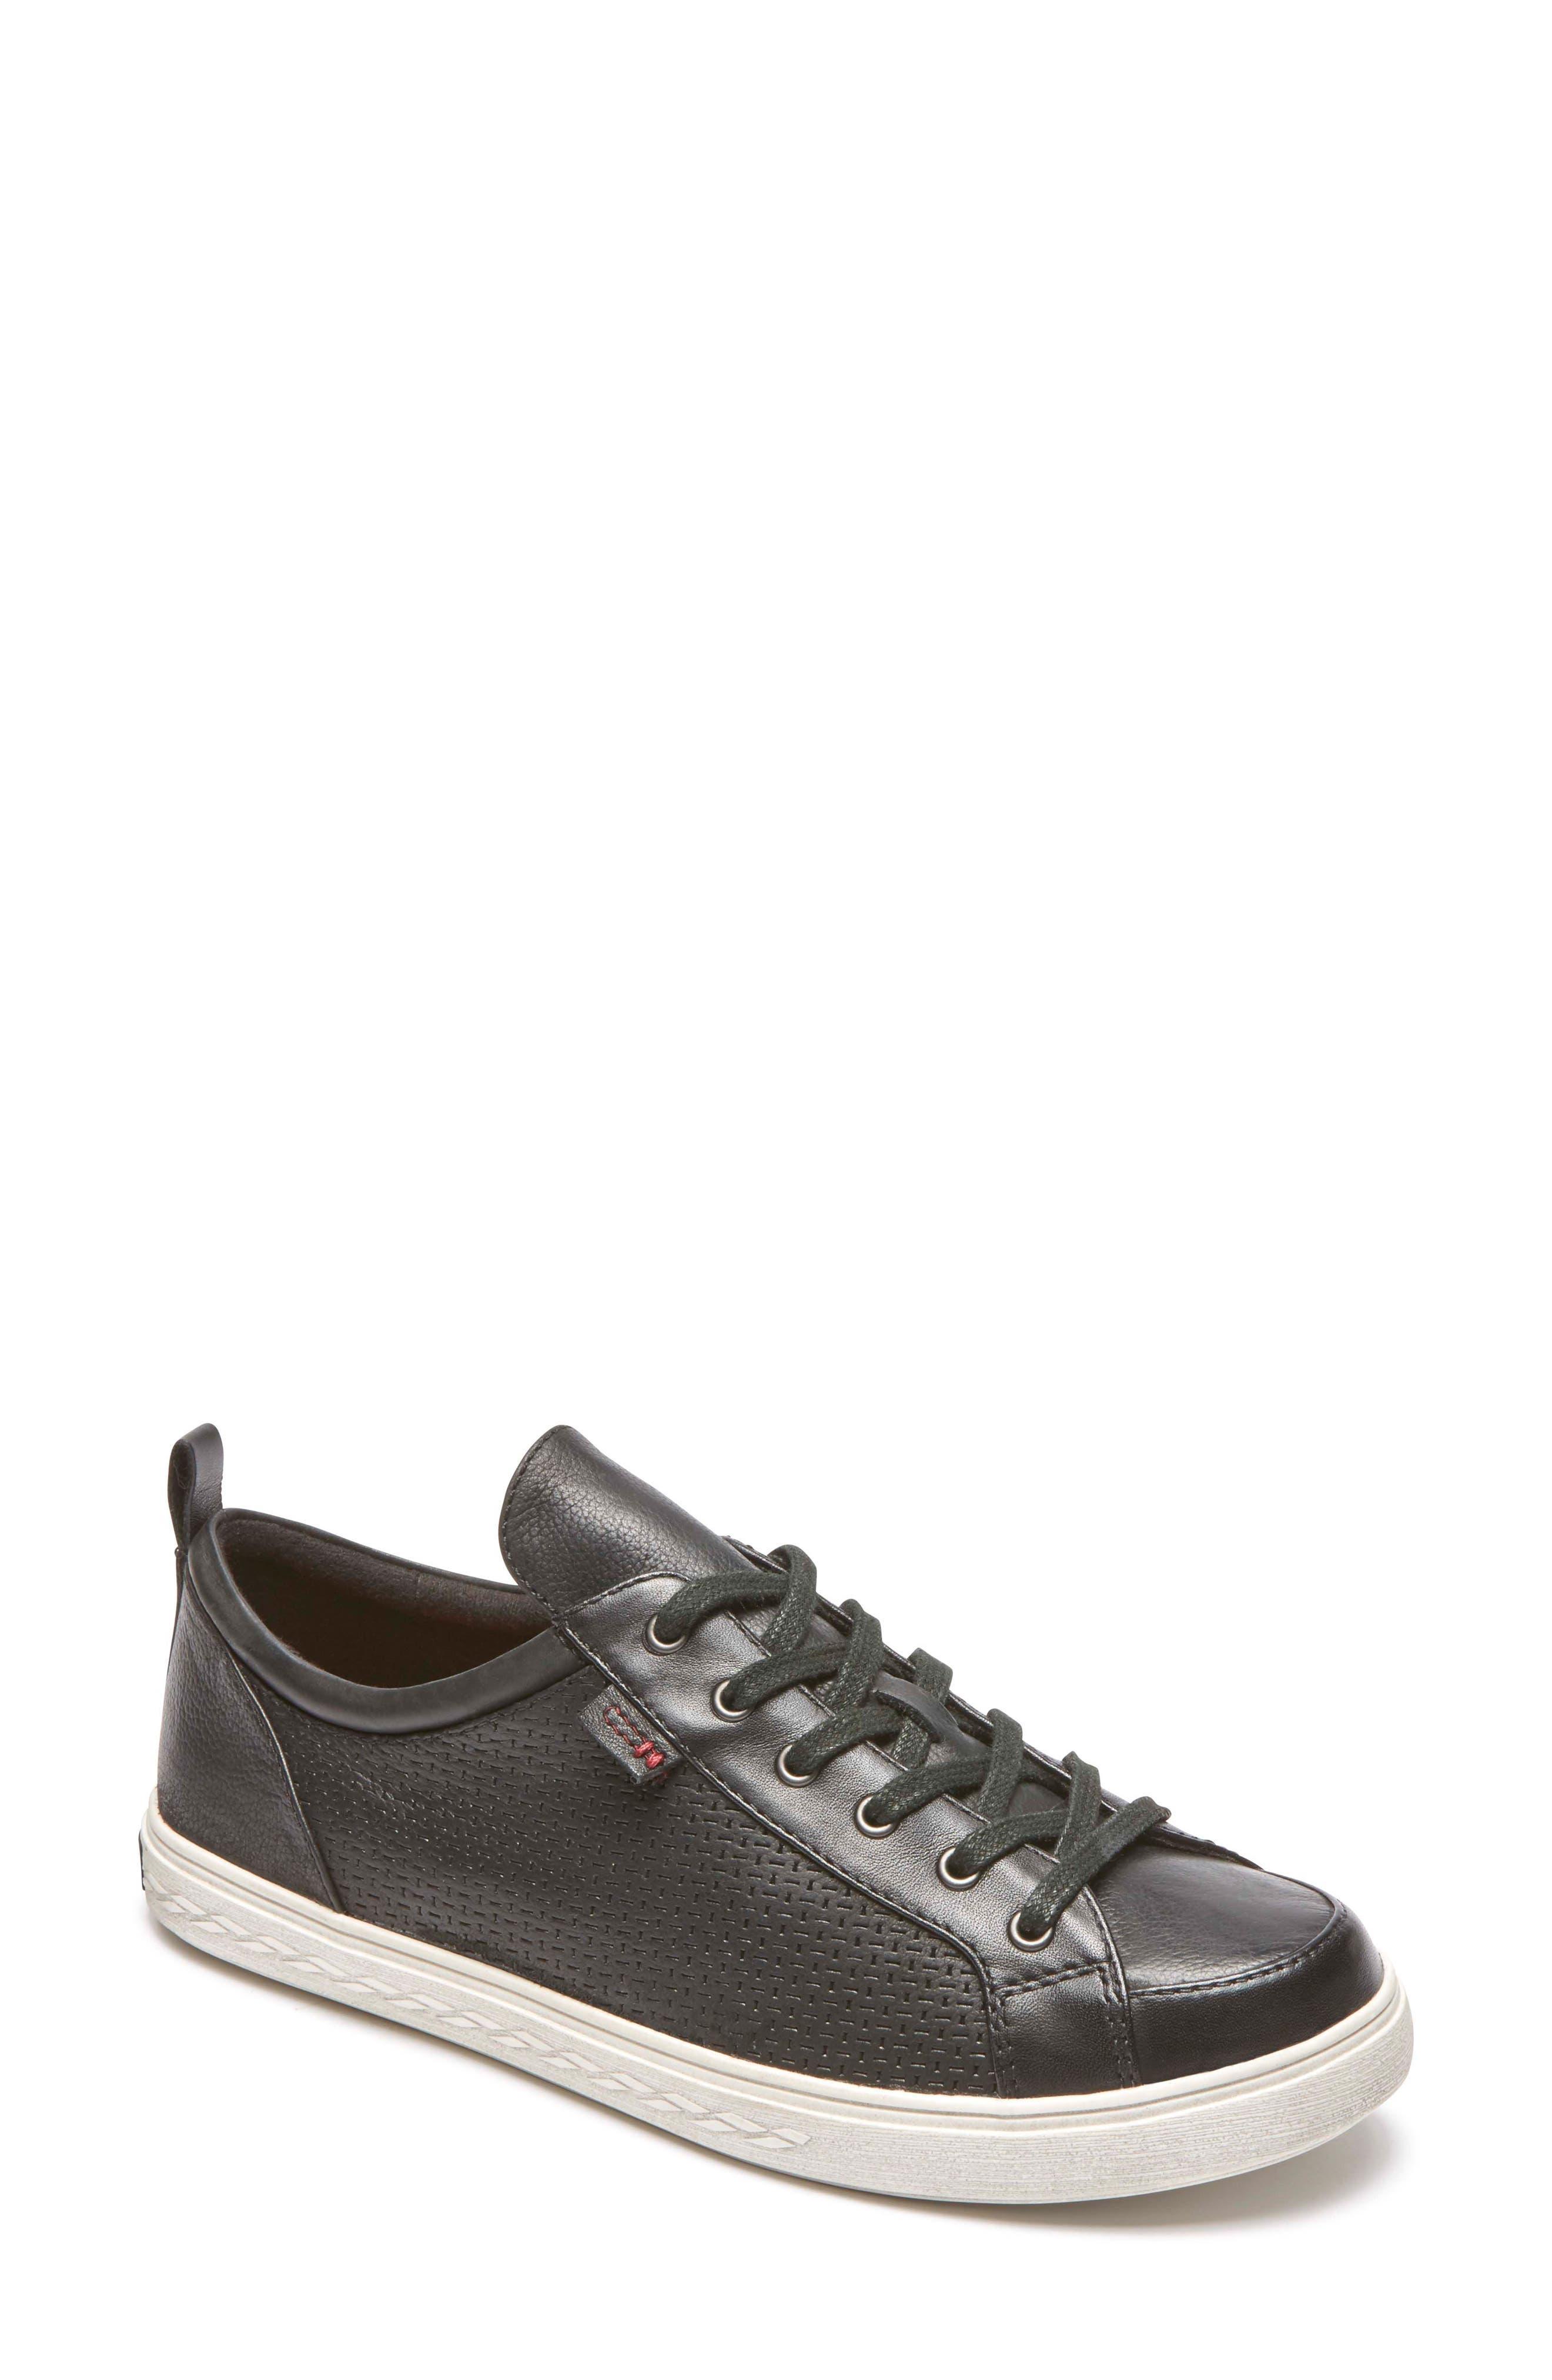 Rockport Cobb Hill Willa Sneaker, Black